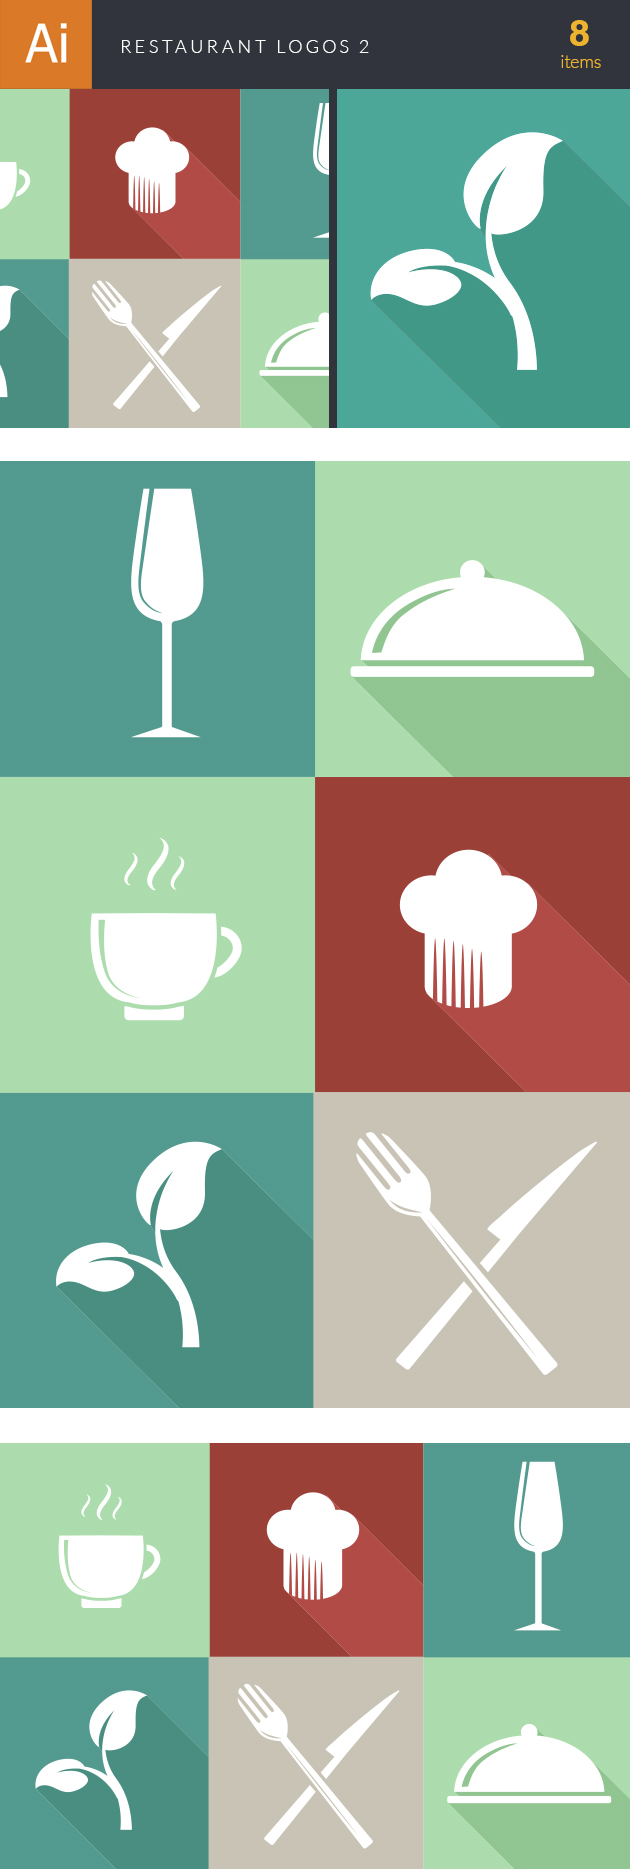 Restaurant Logos Vector 2 designtnt restaurant logos vector 2 vector large